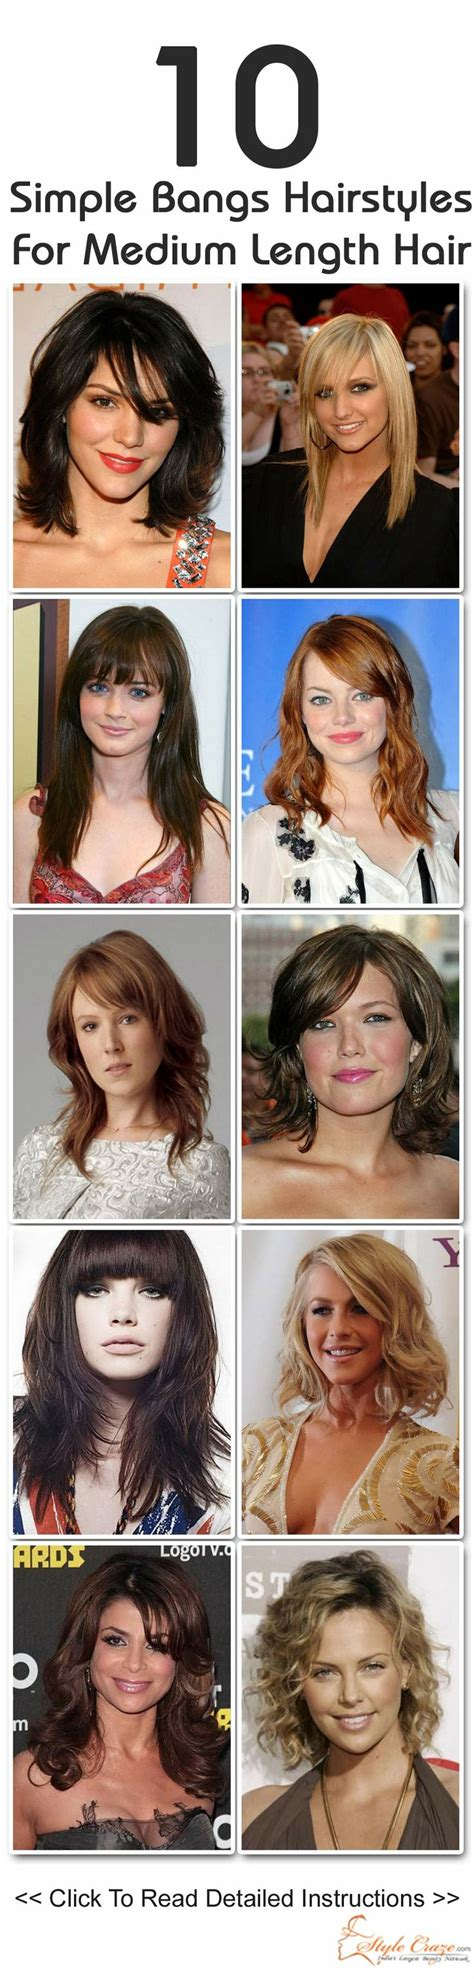 easiest bangs to maintain 10 simple bangs hairstyles for medium length hair bang